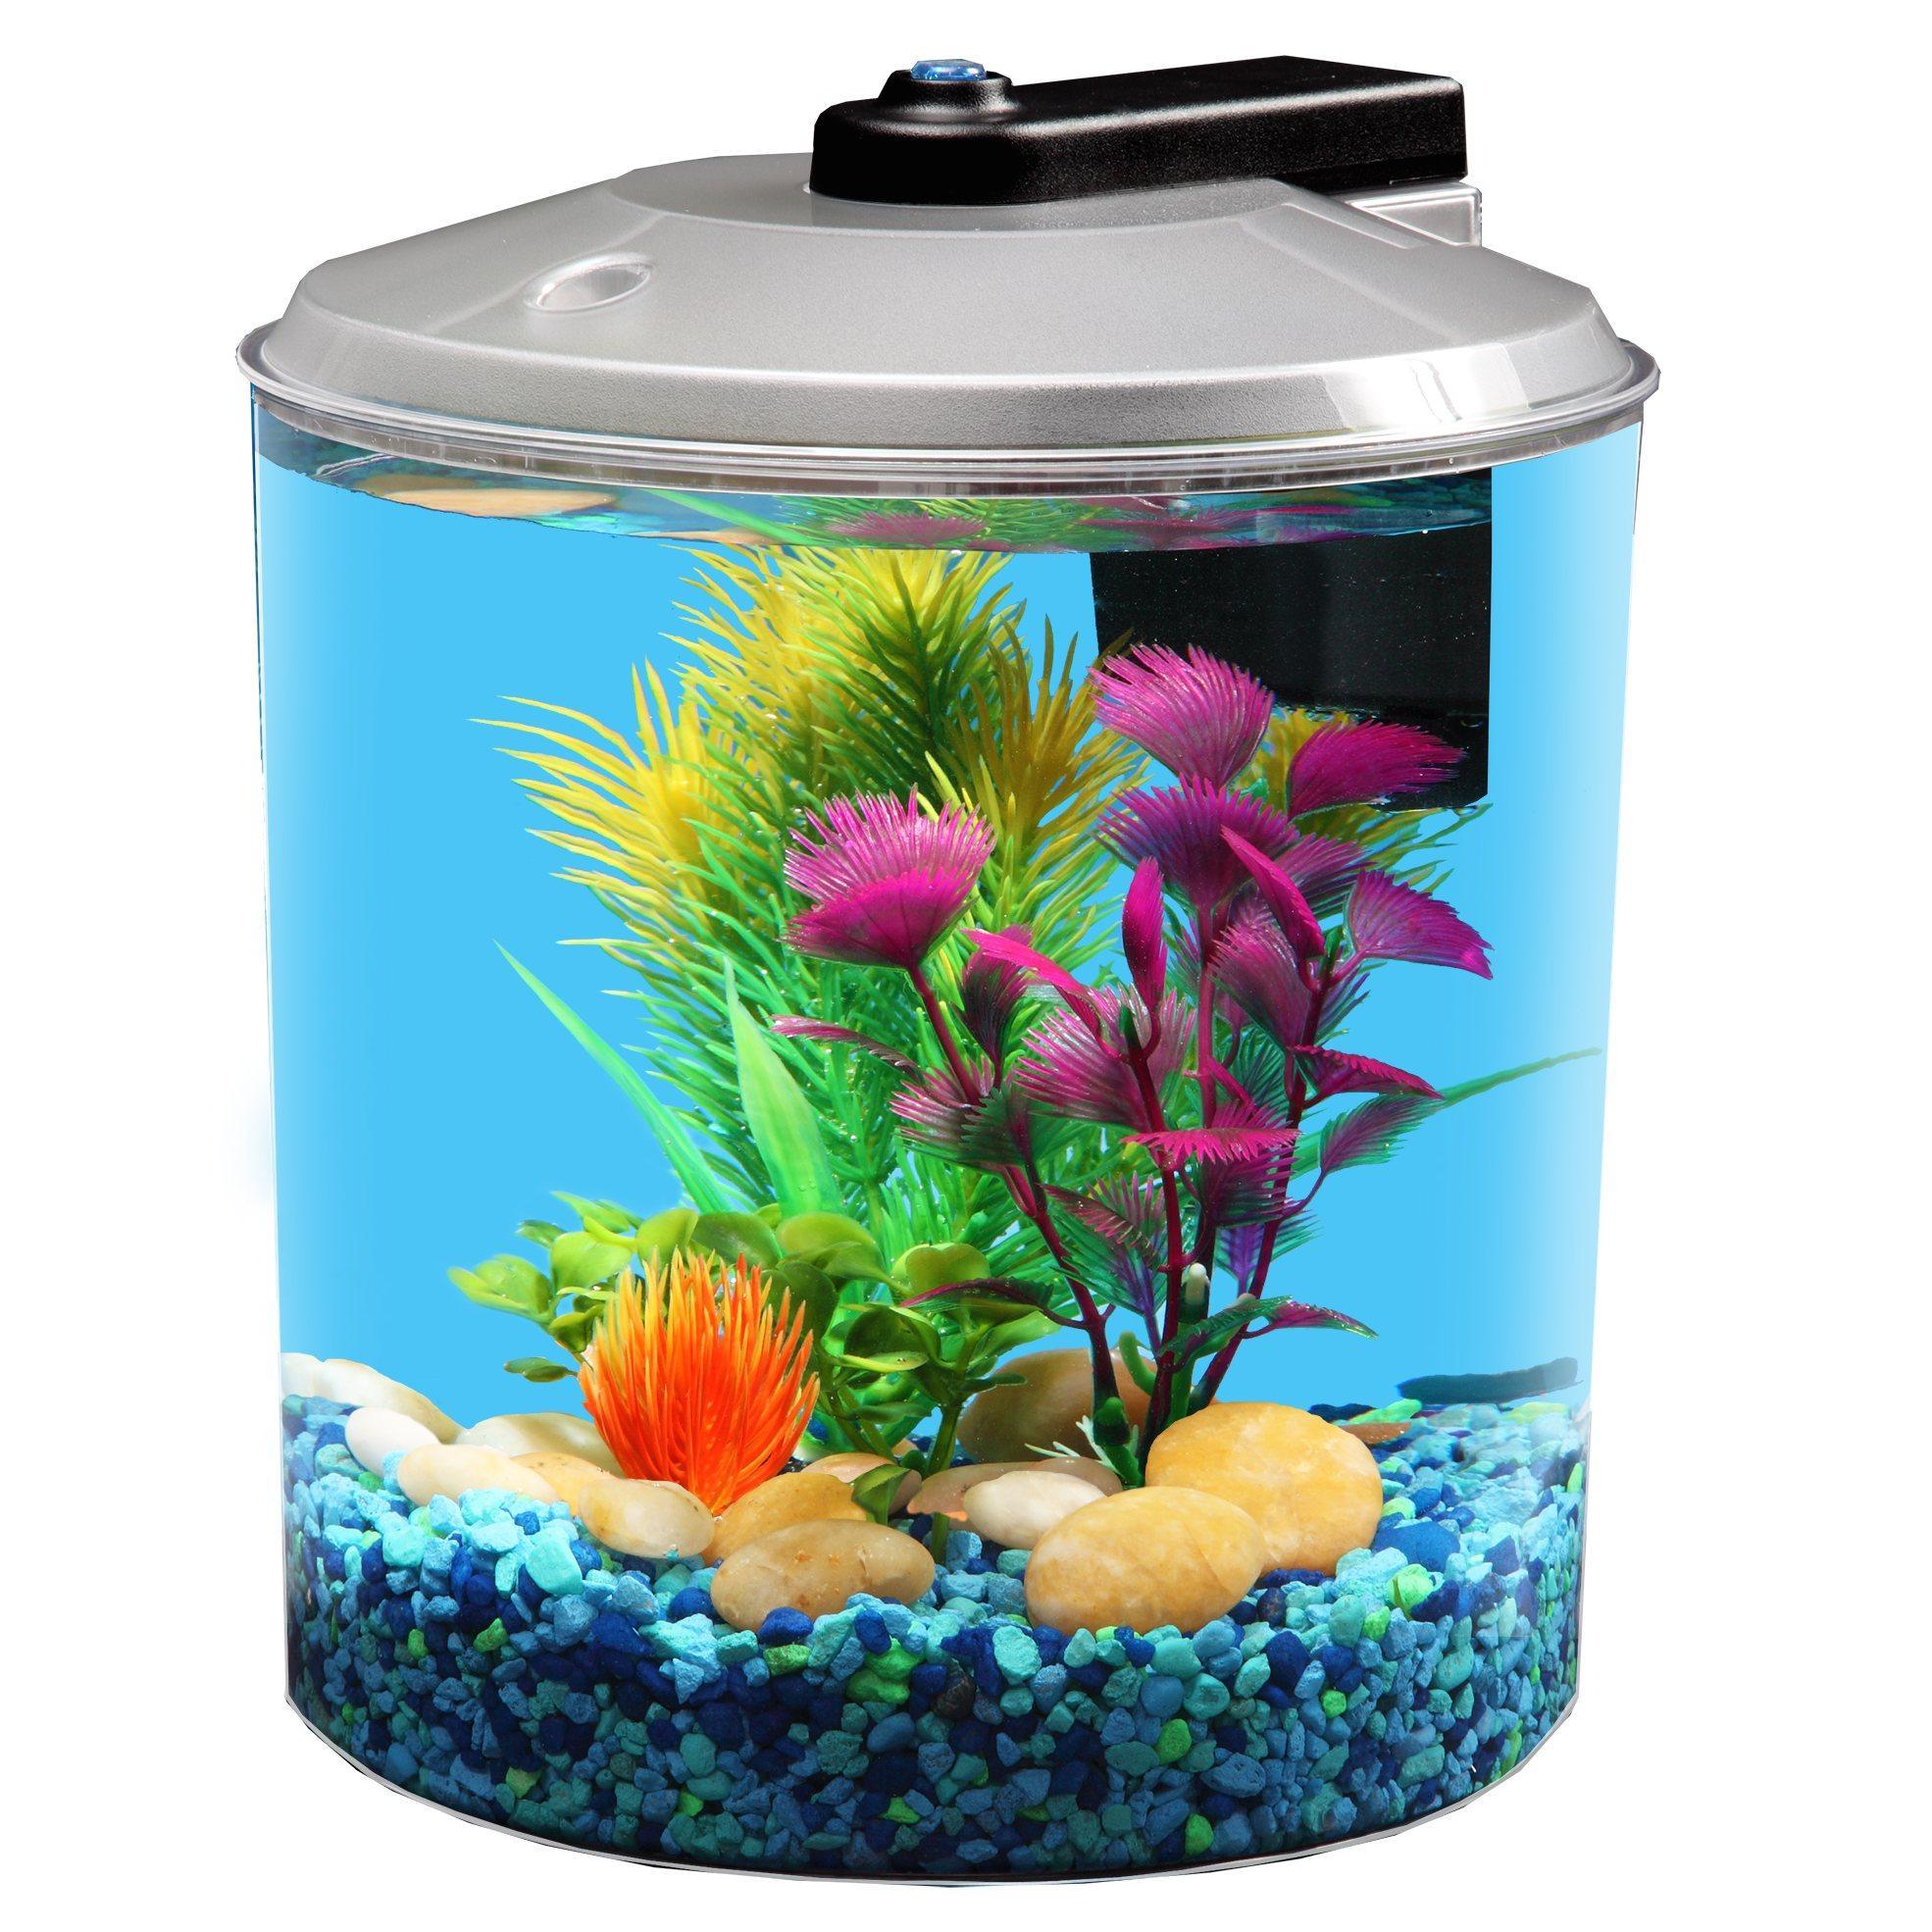 Kollercraft api betta kit 360 degree fish tank 1 5 gallon for Fish and aquarium stores